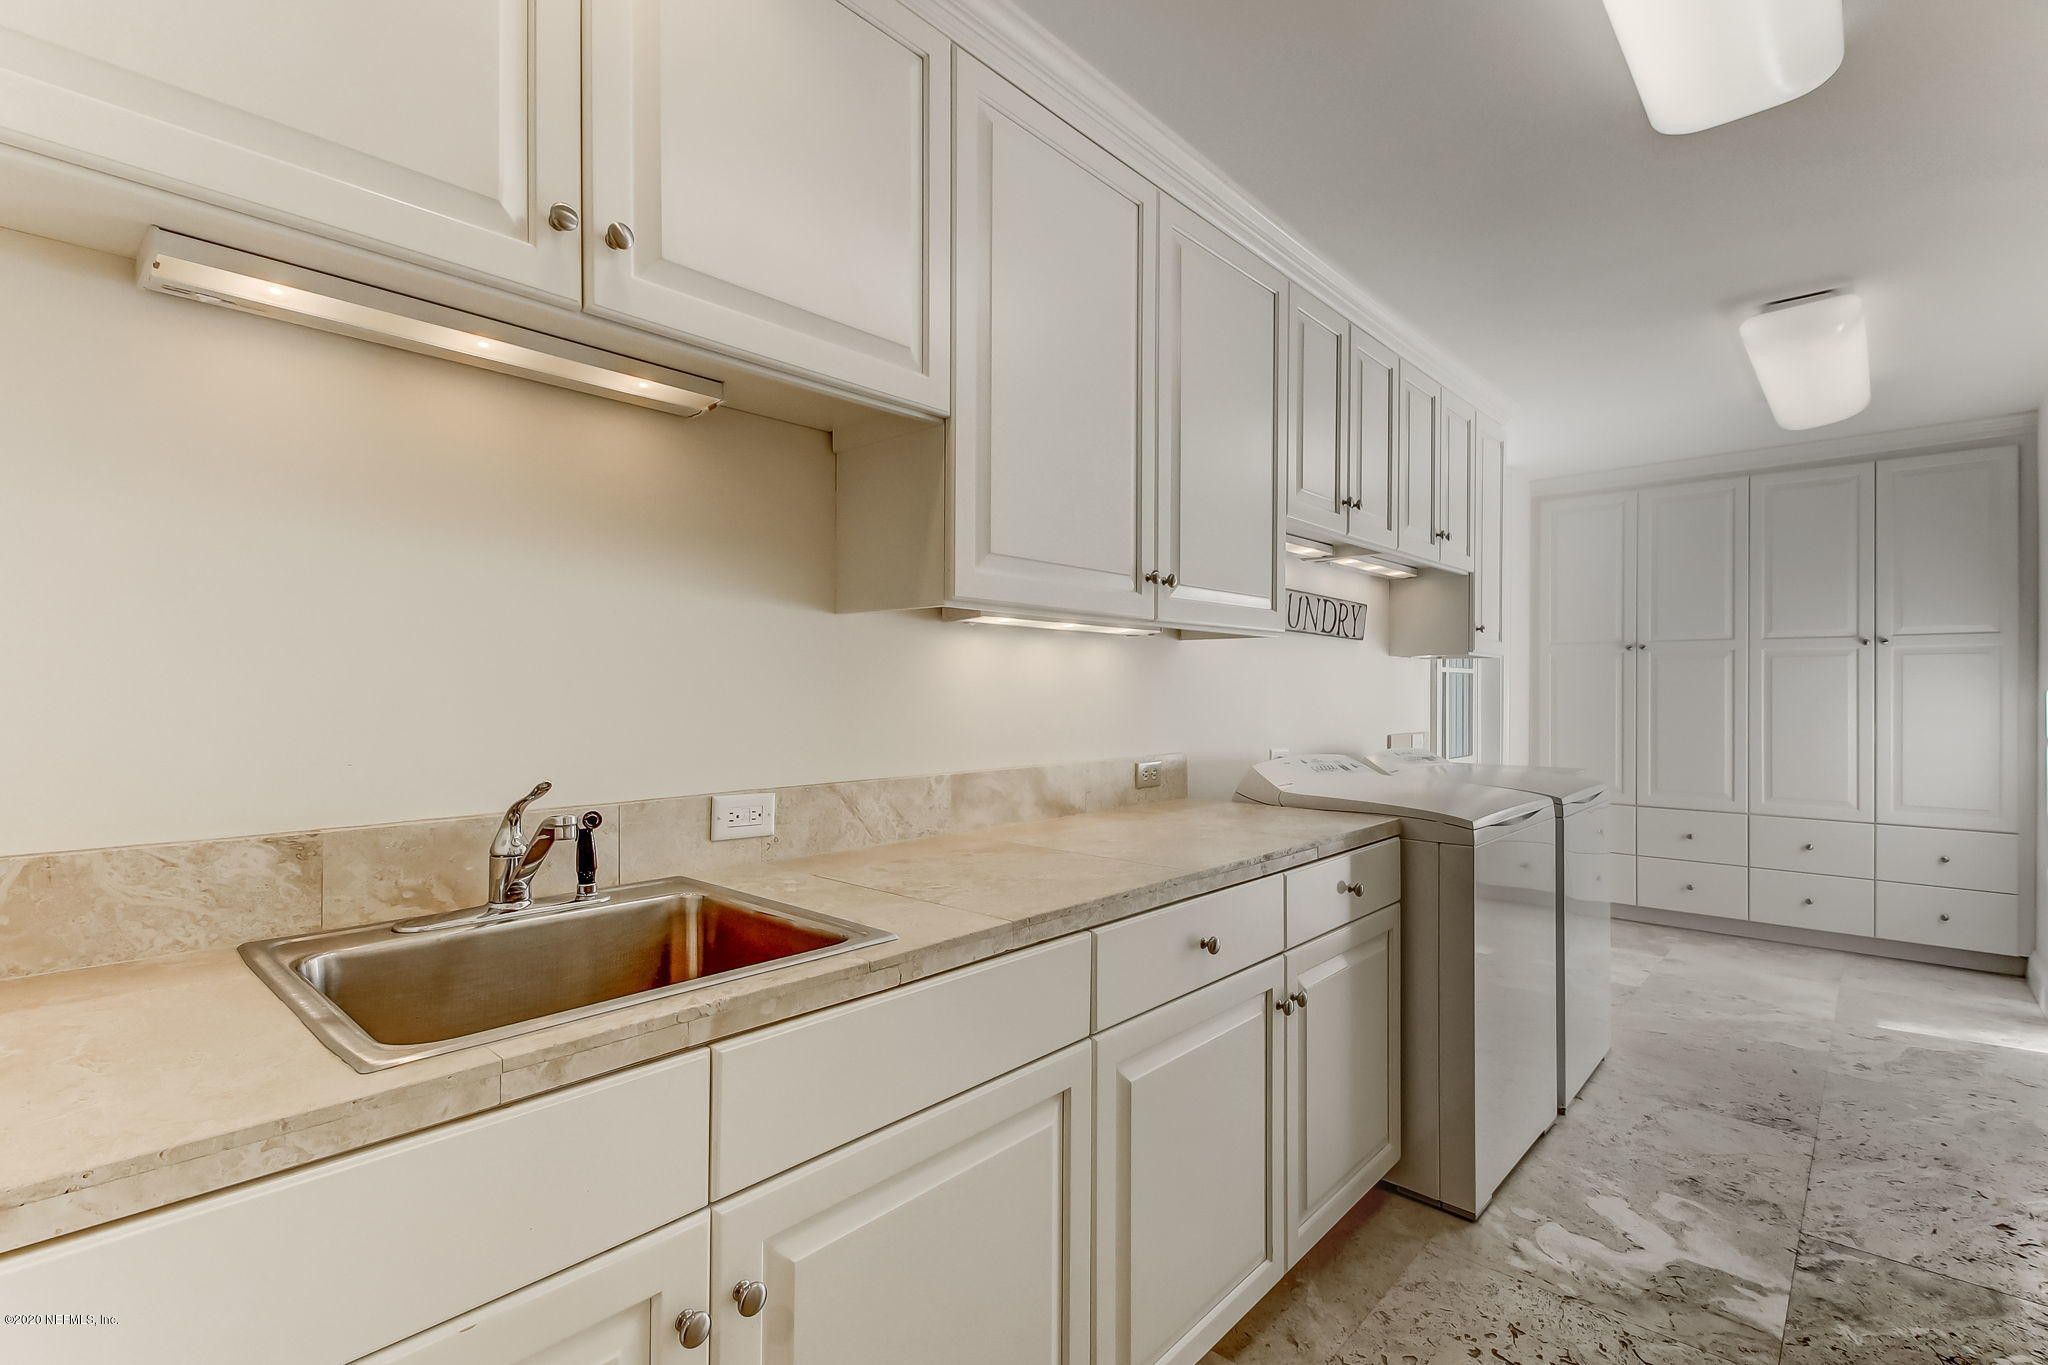 24732 HARBOUR VIEW, PONTE VEDRA BEACH, FLORIDA 32082, 5 Bedrooms Bedrooms, ,5 BathroomsBathrooms,Residential,For sale,HARBOUR VIEW,1031871